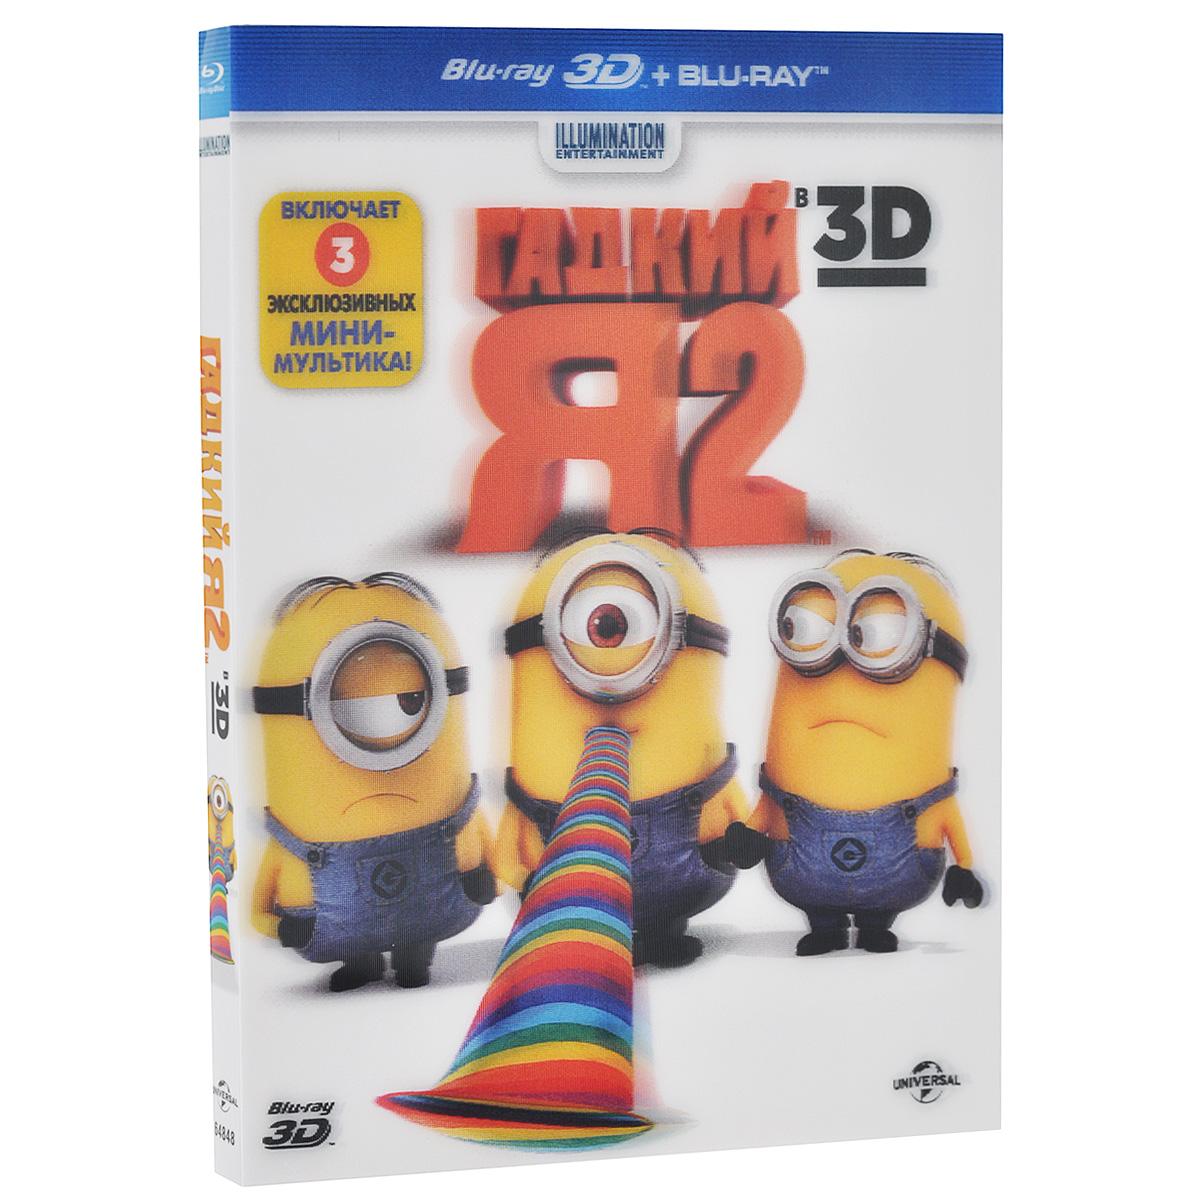 Zakazat.ru Гадкий Я 2 3D и 2D (2 Blu-ray)